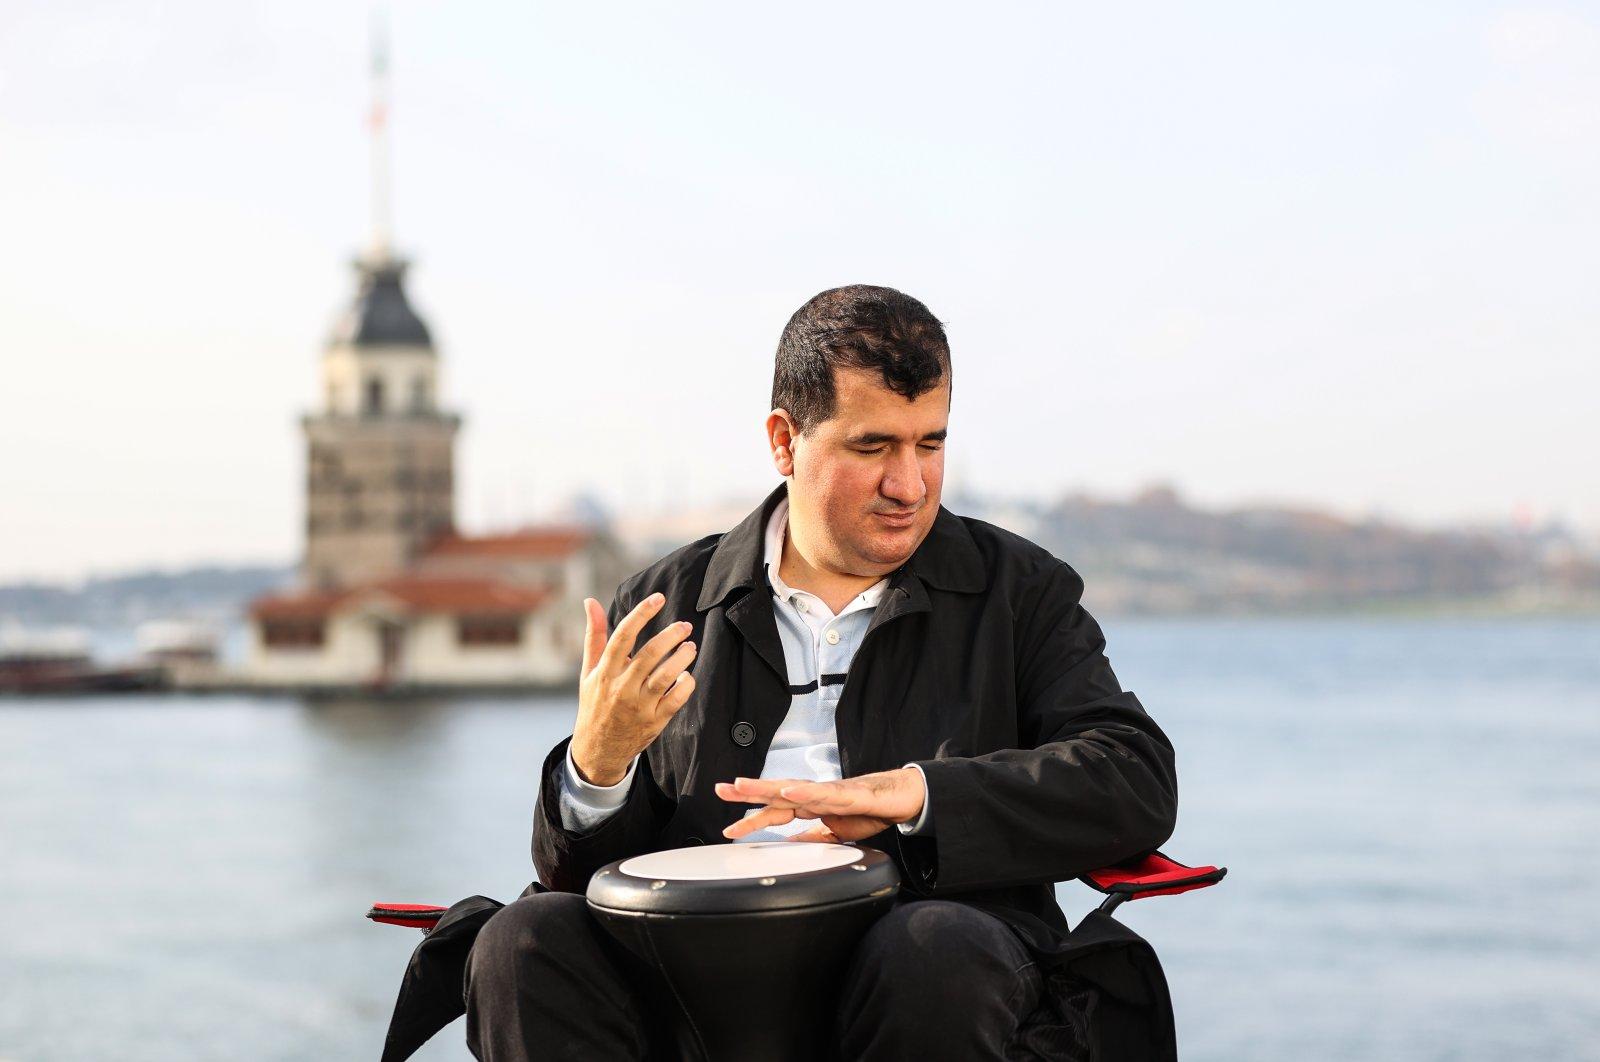 Bilal Göregen plays the darbuka in front of Istanbul's iconic Maiden's Tower, Turkey, Dec. 7, 2020. (AA Photo)